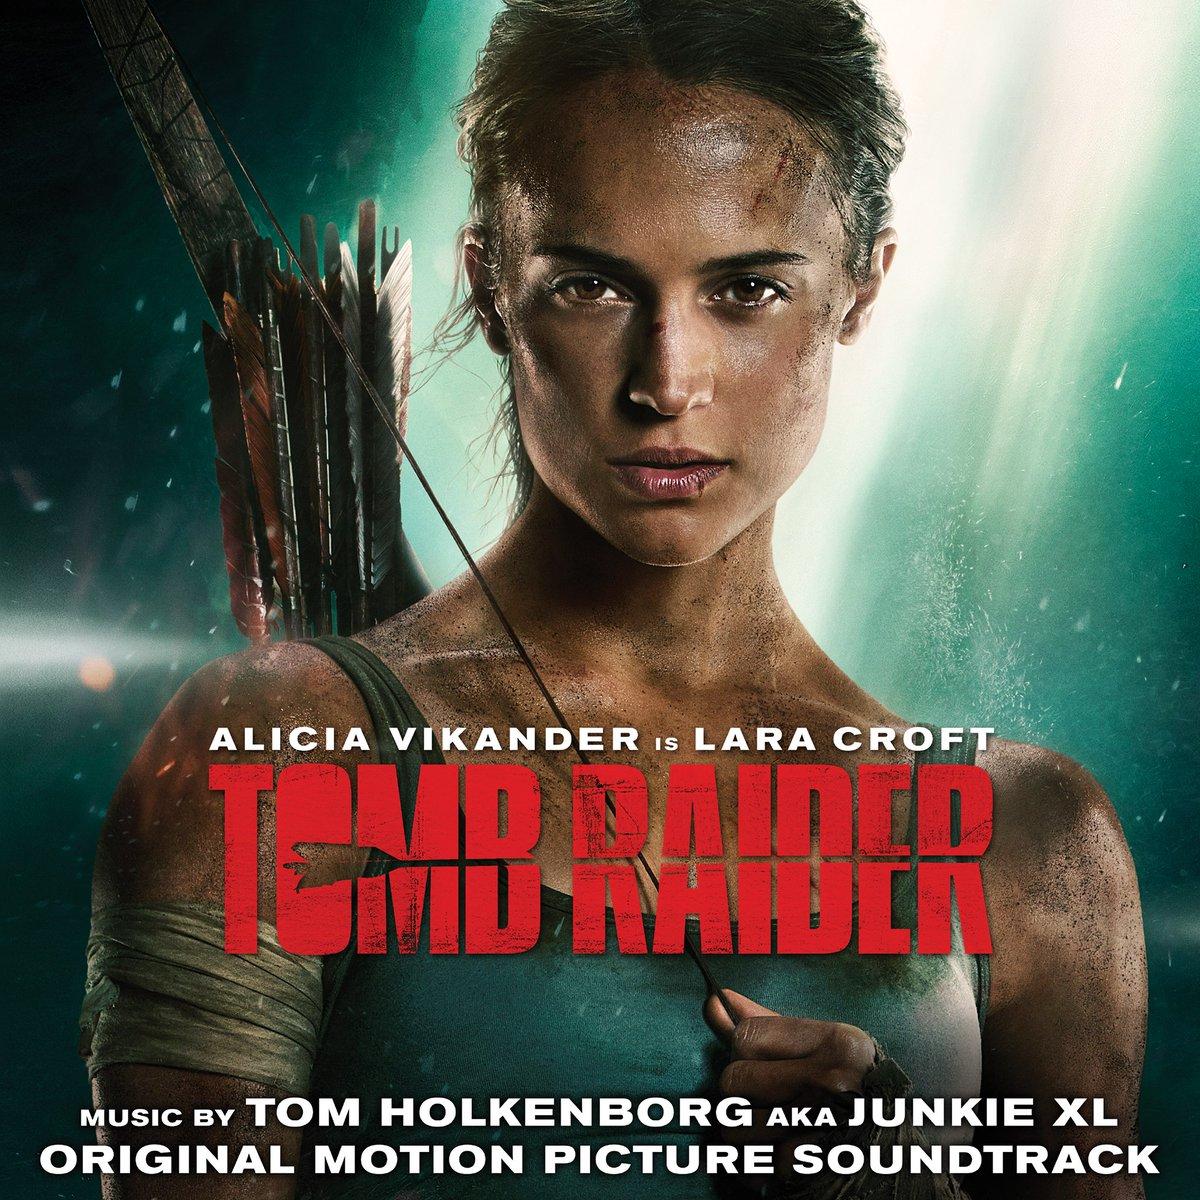 Tomb Raider Film Soundtrack verfügbar